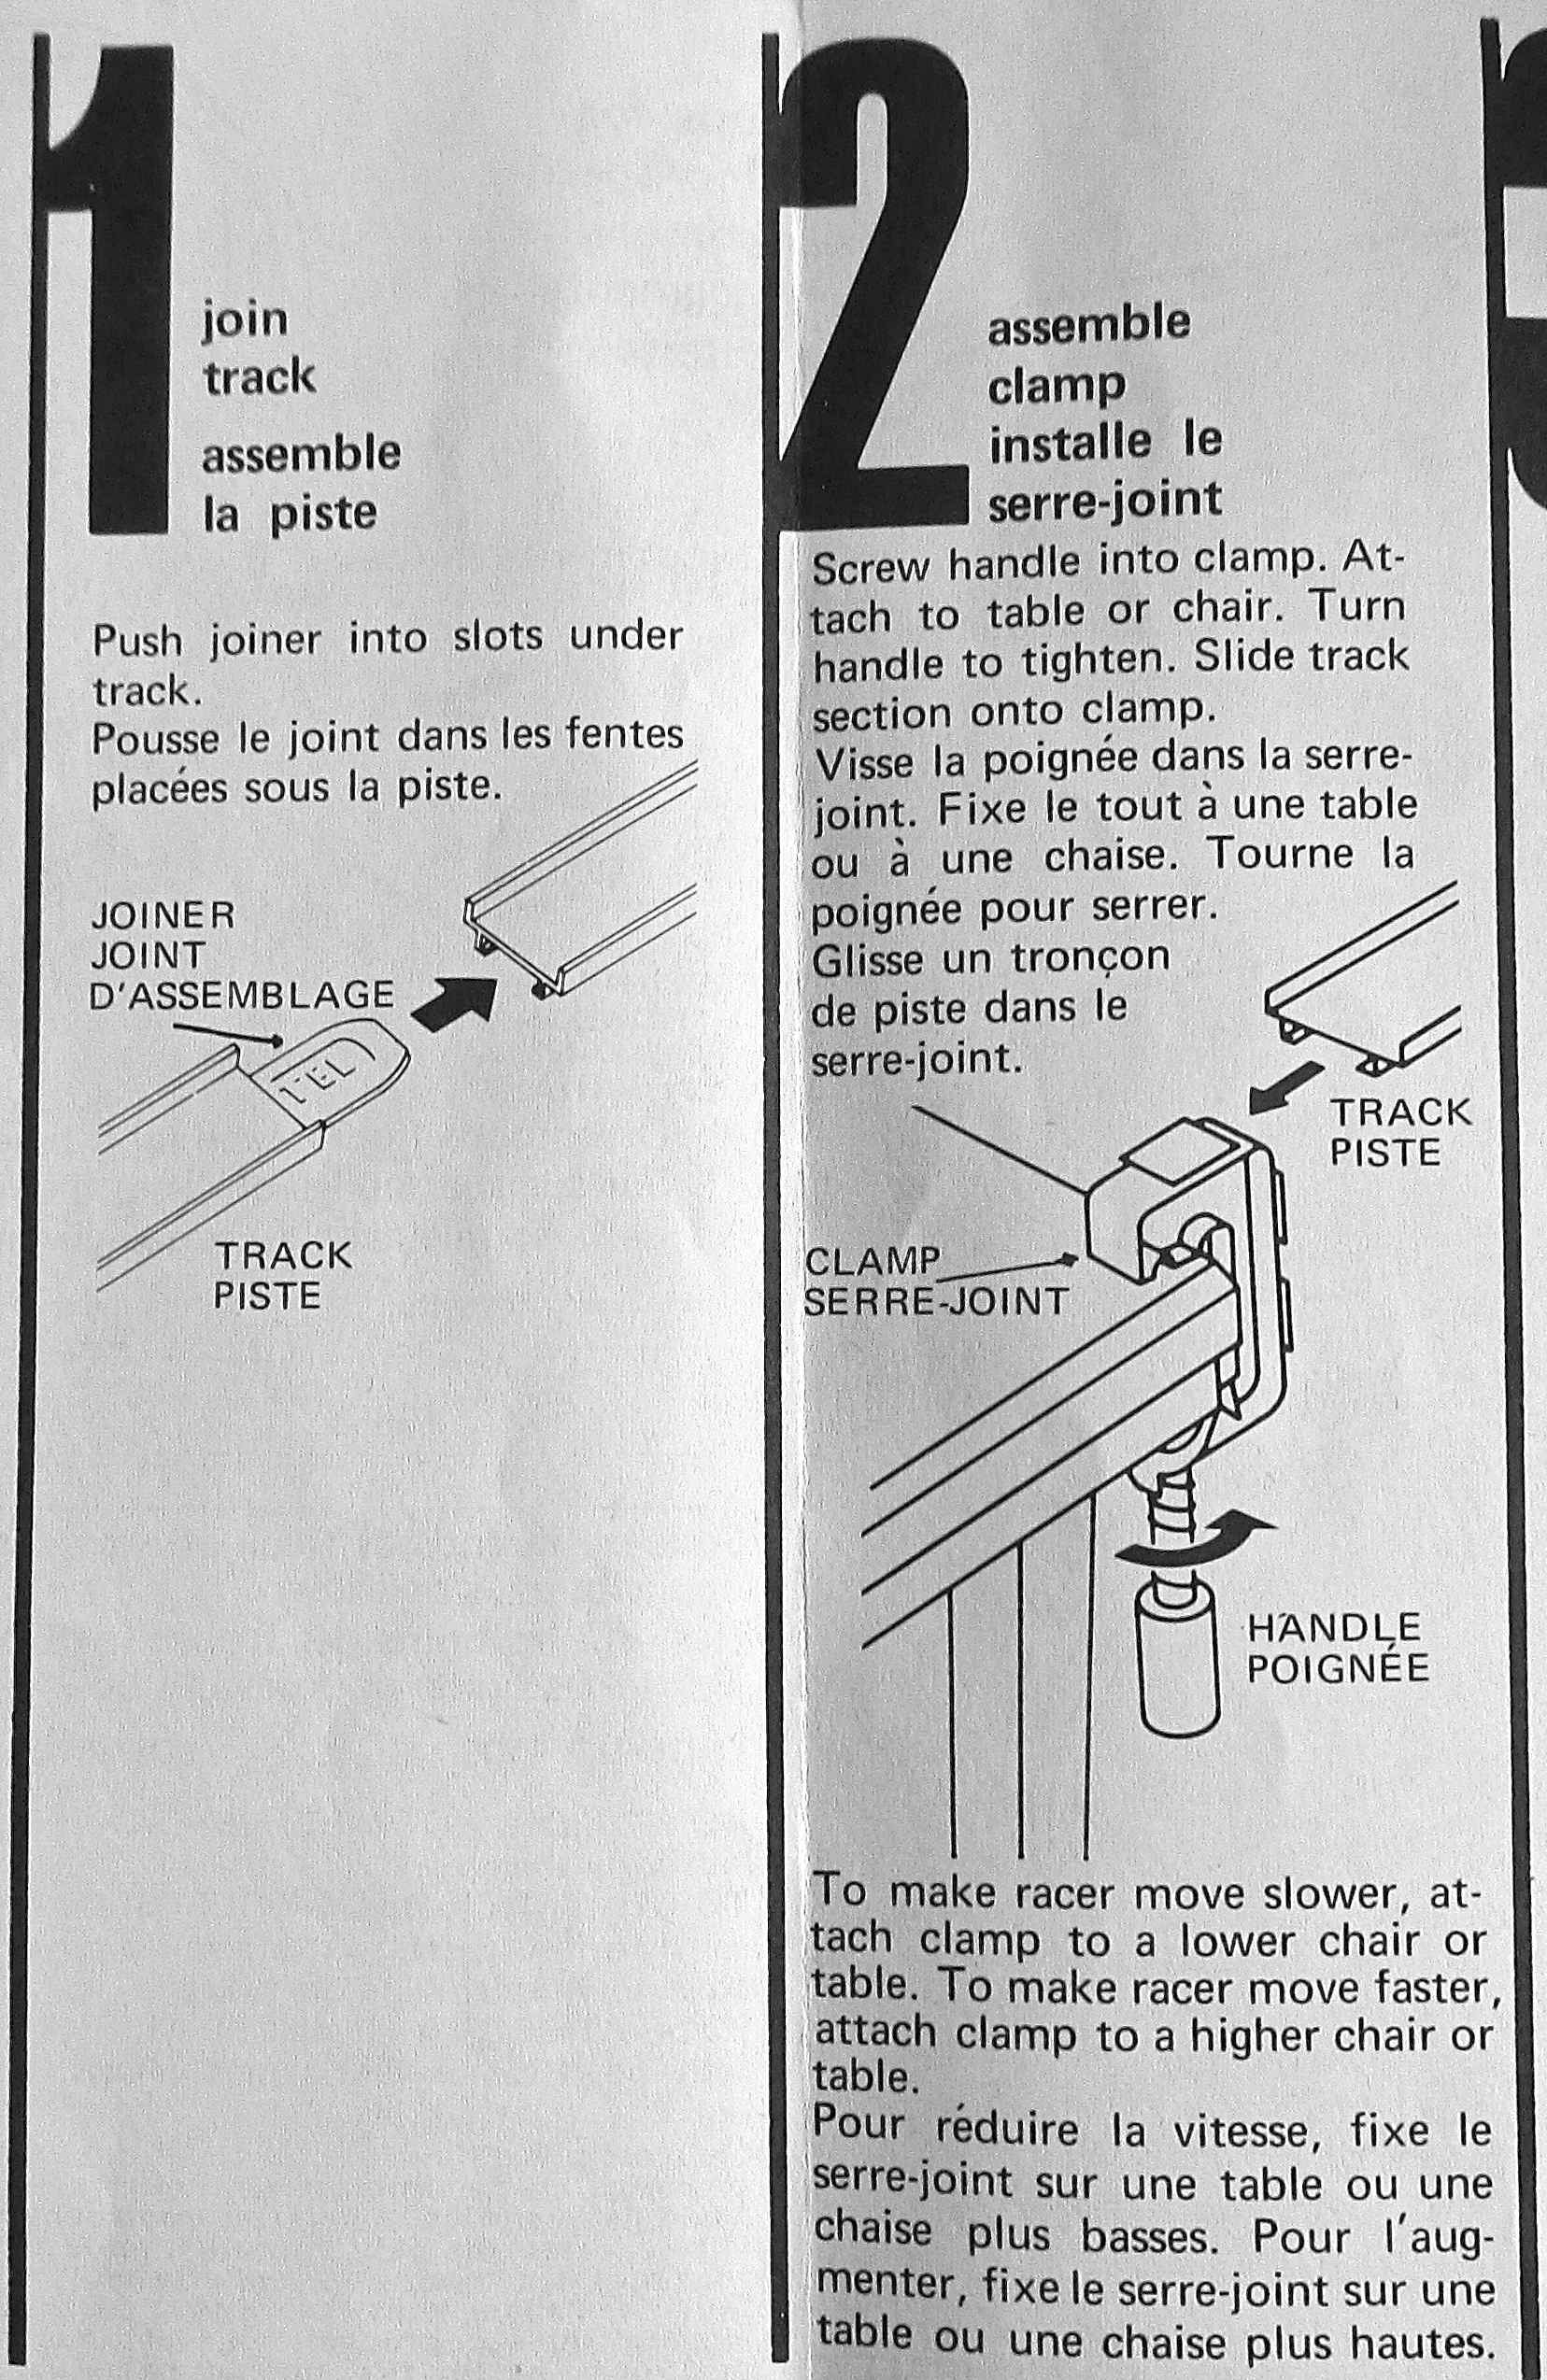 hot wheels fireball instructions